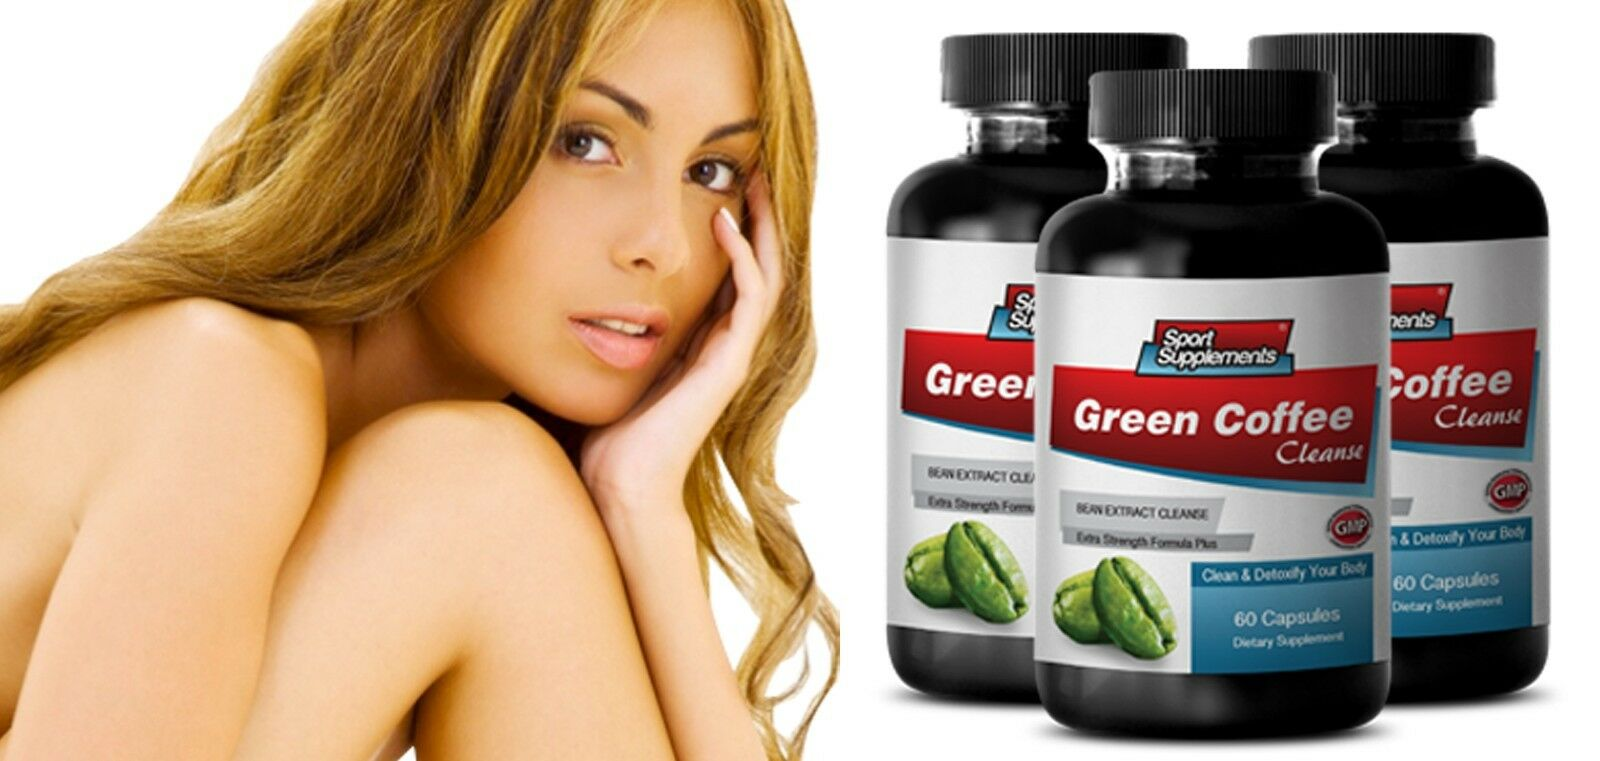 antioxidant solgar green coffee cleanse 400mg 3b